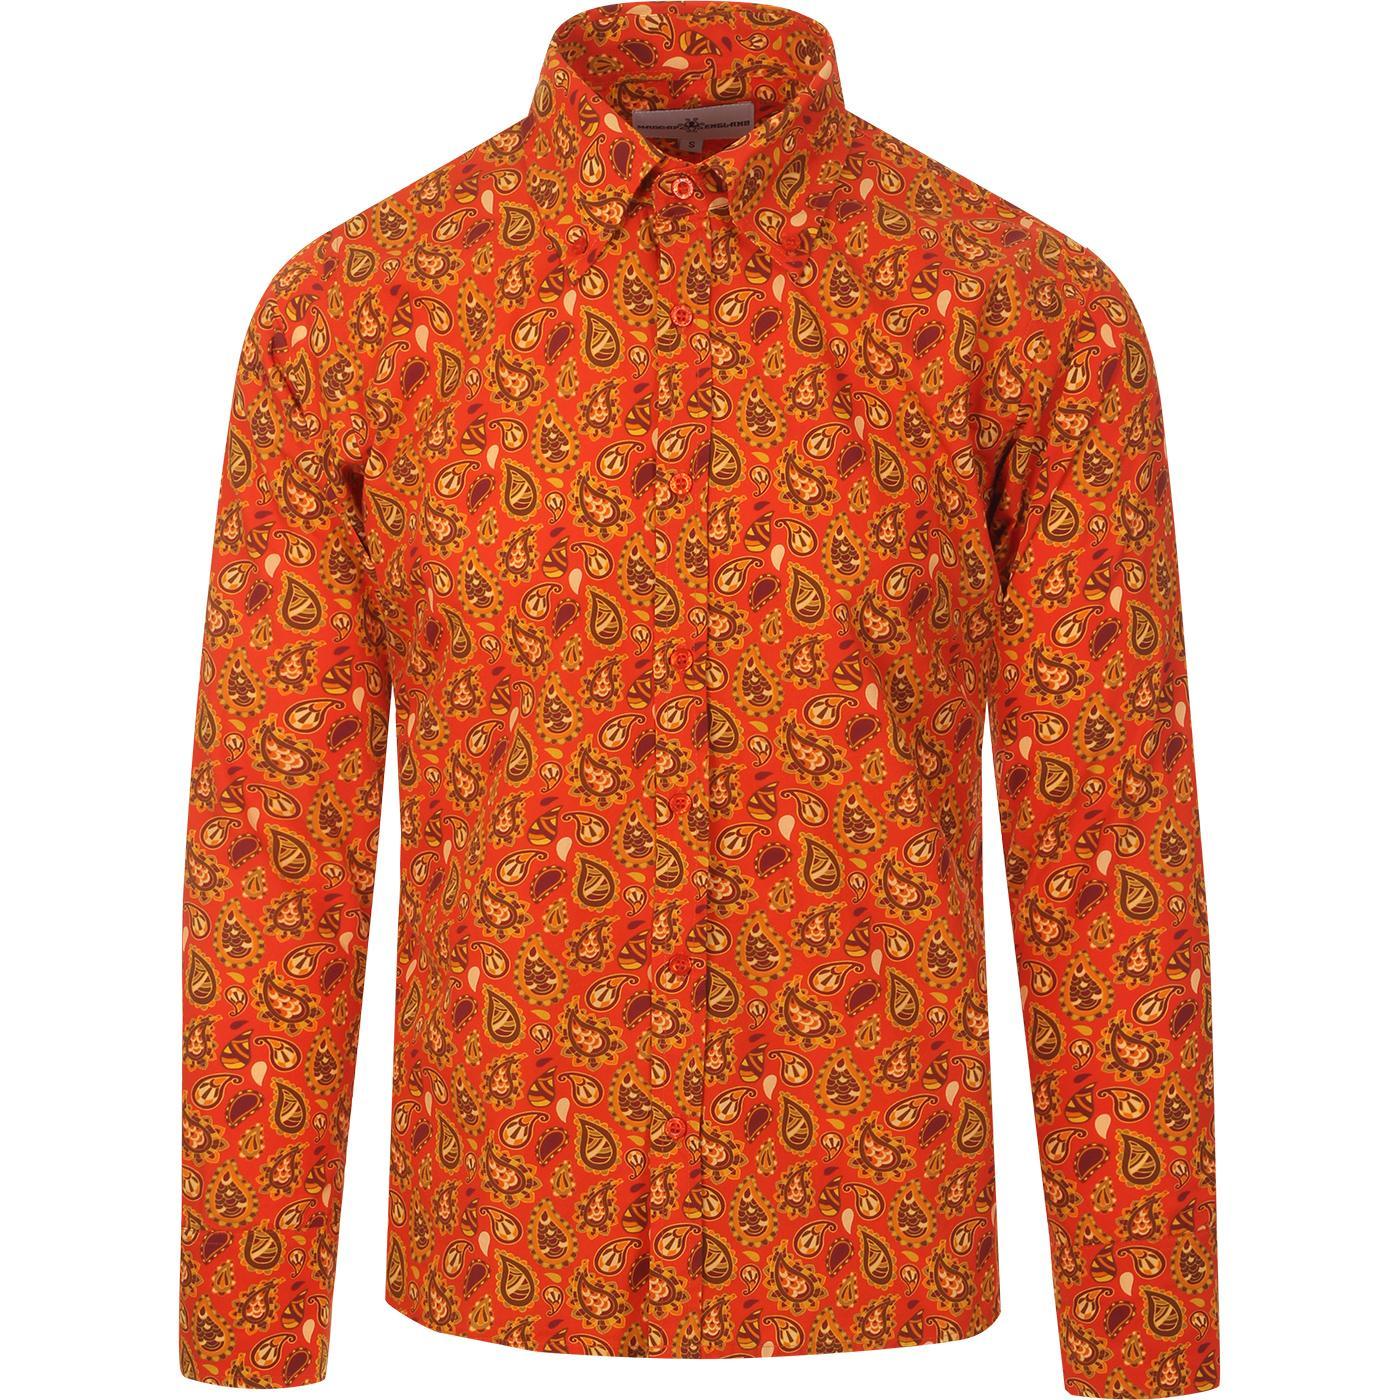 madcap england mens trip paisley print long sleeve shirt red gold